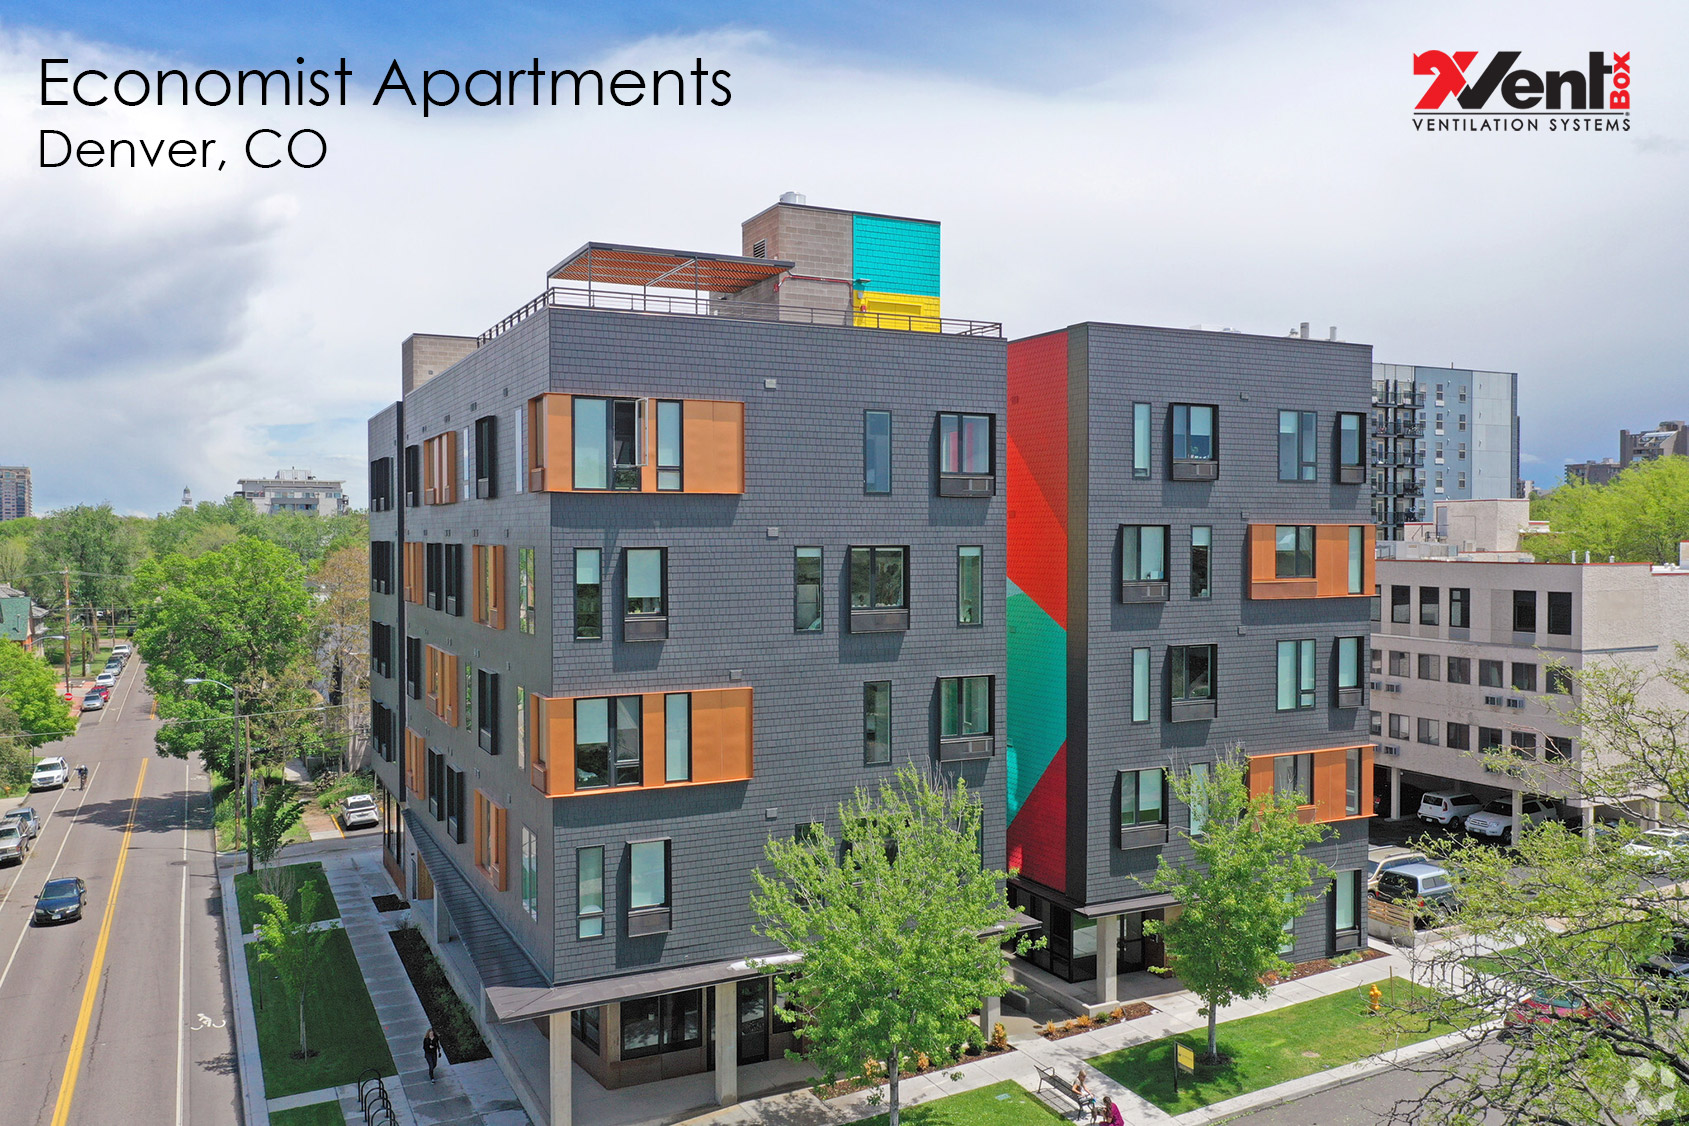 Economist Apartments